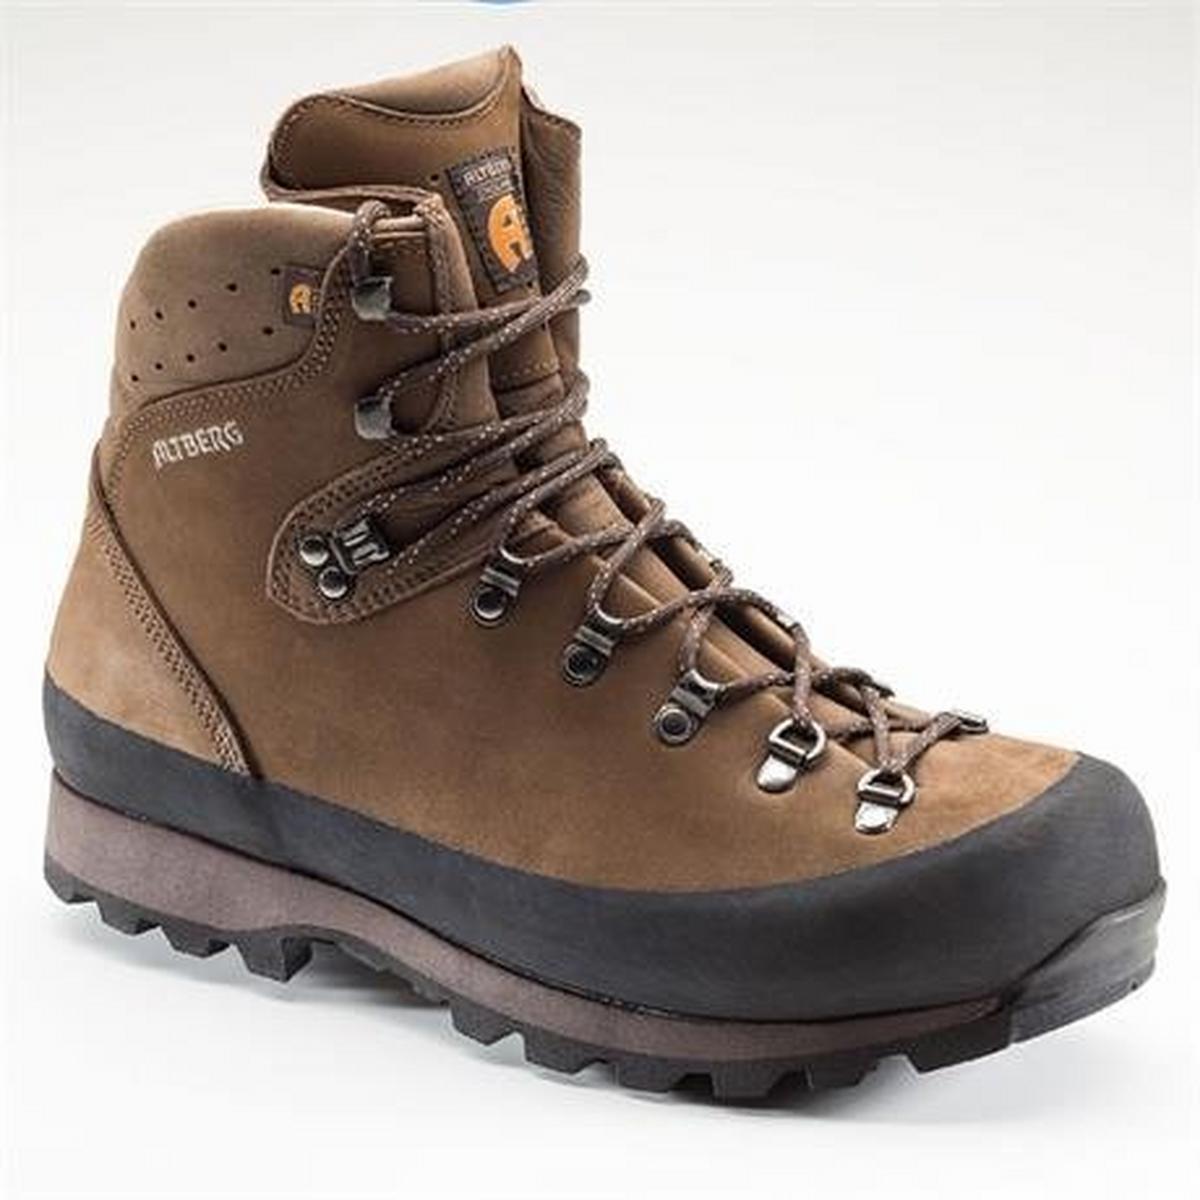 Altberg Boots Men's Nordkapp A-Forme Brown